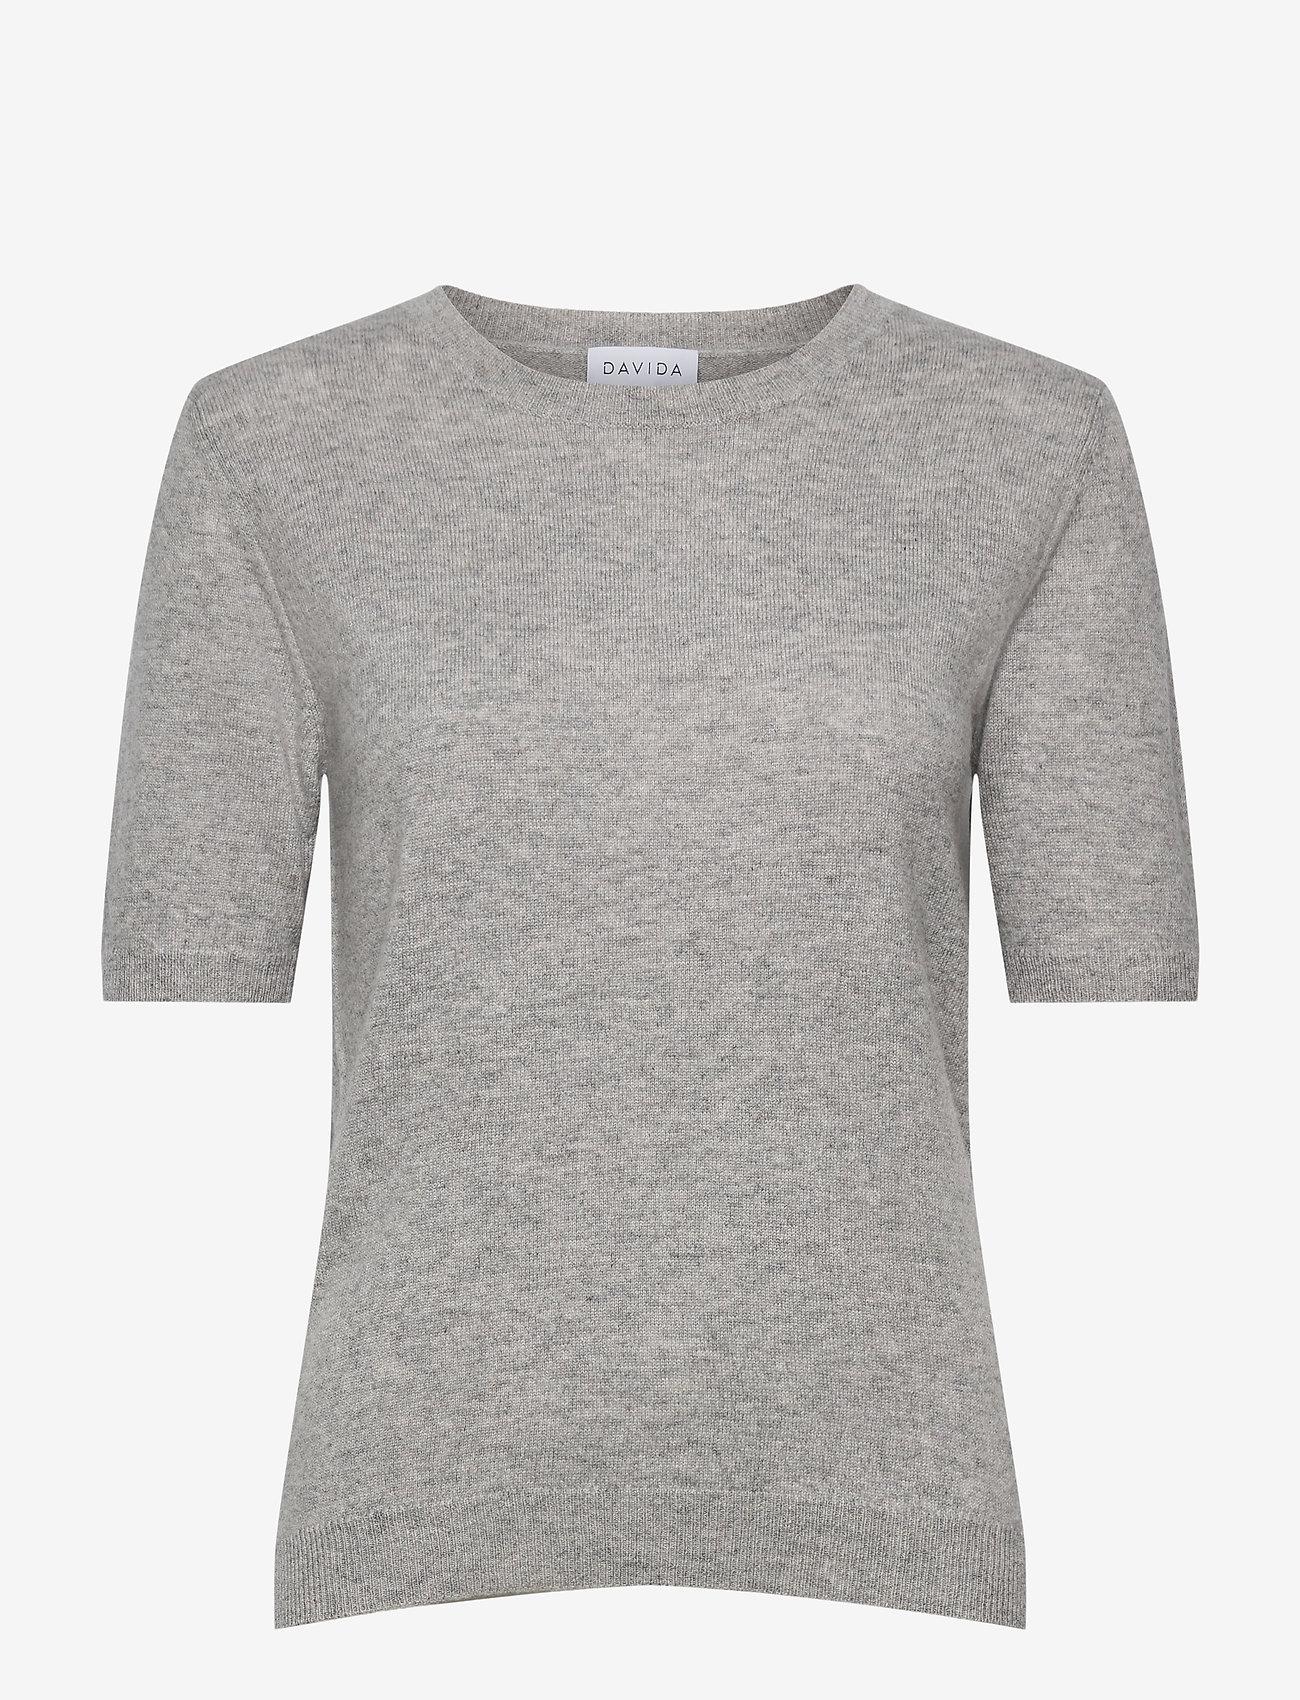 Davida Cashmere - T-shirt Oversized - knitted tops - ligth grey - 0